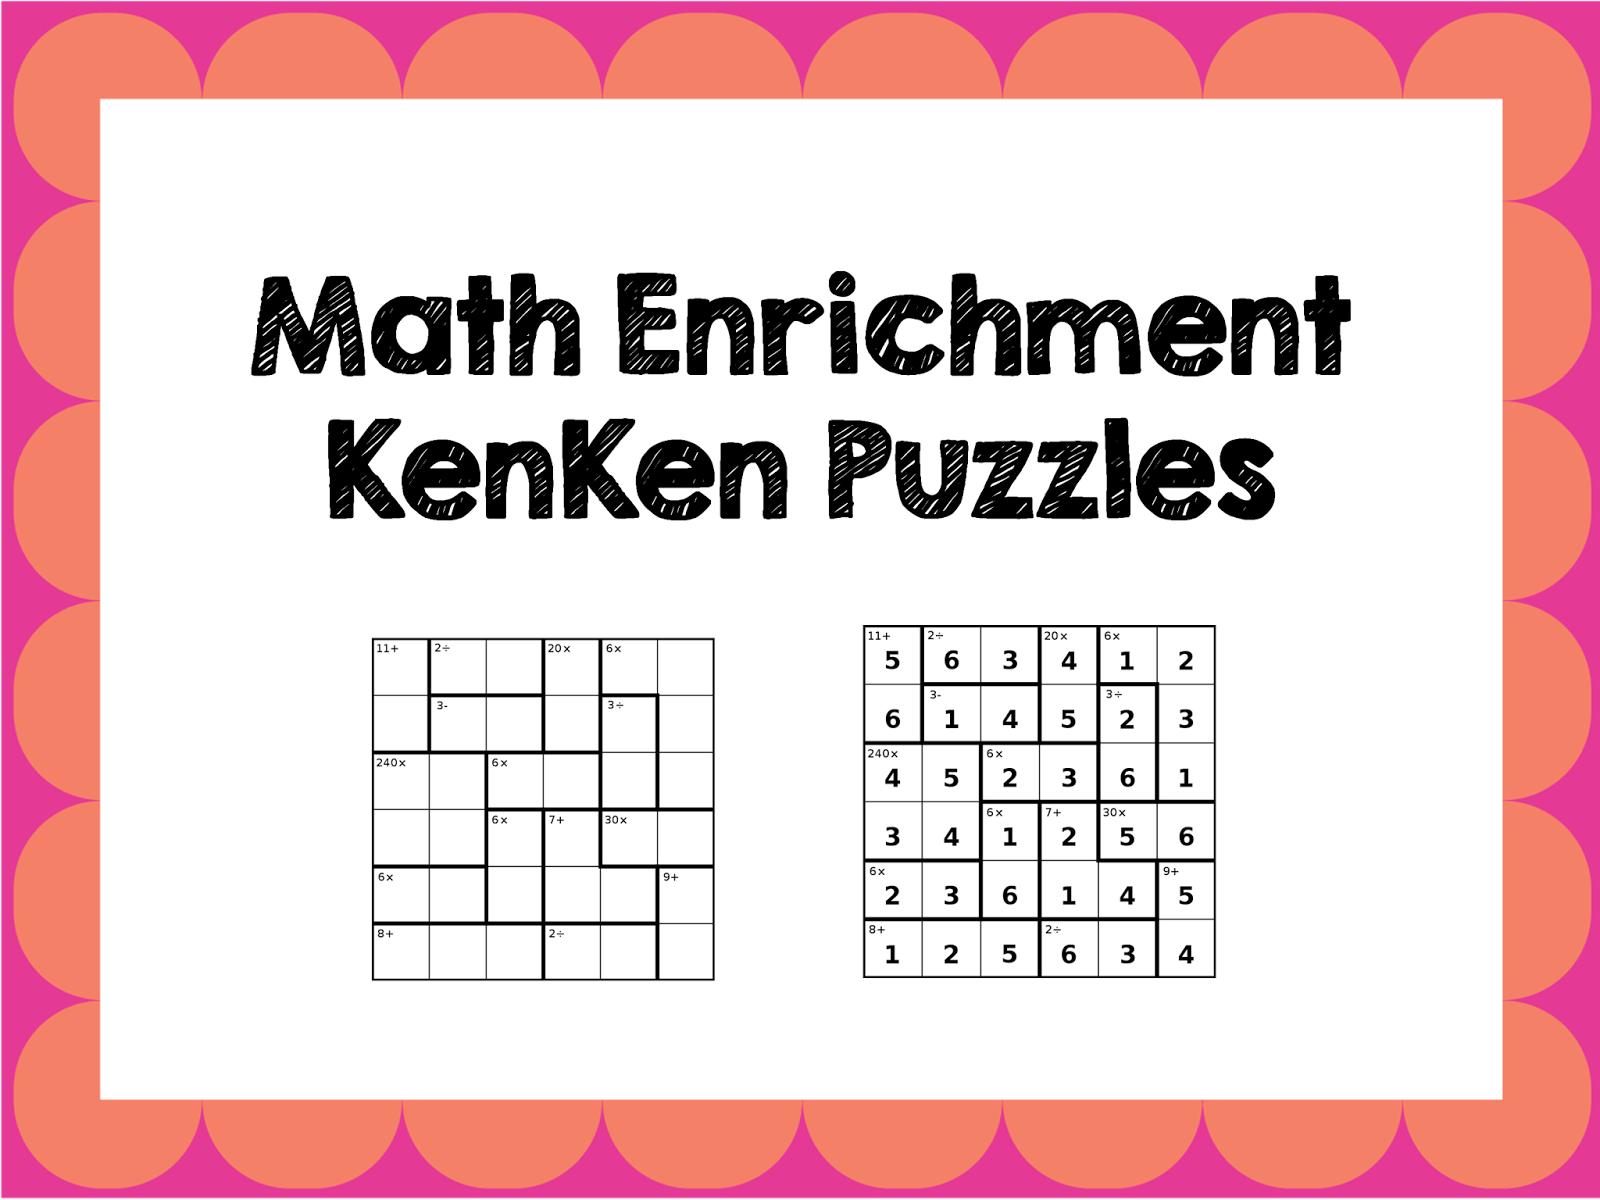 Math Enrichment Freebies - Kenken Puzzles   Ed - Math   Math - Printable Kenken Puzzles